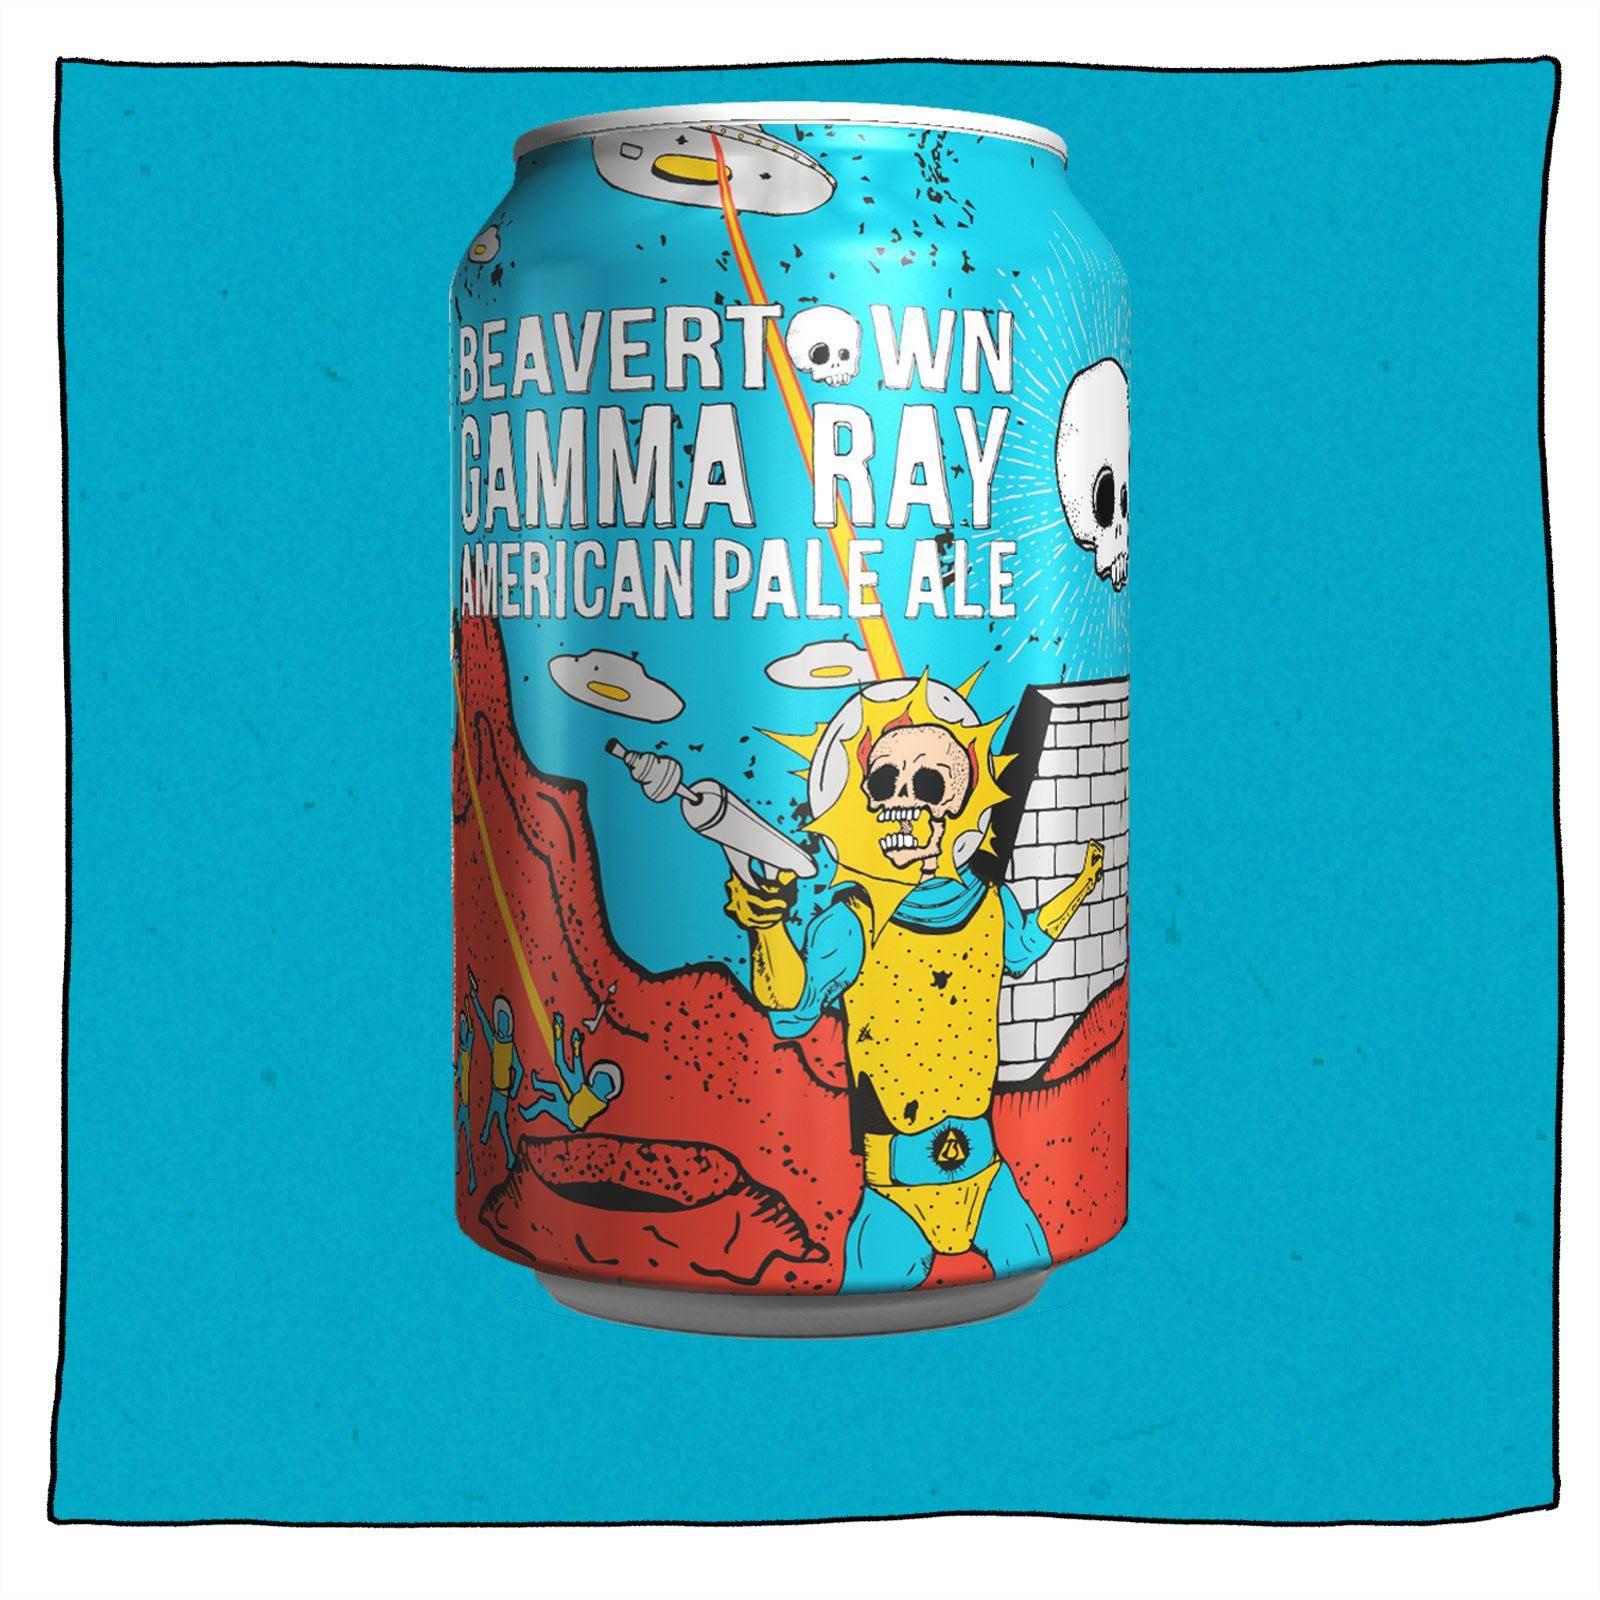 Contents: Beavertown Christmas Core Beer Advent Calendar 2020